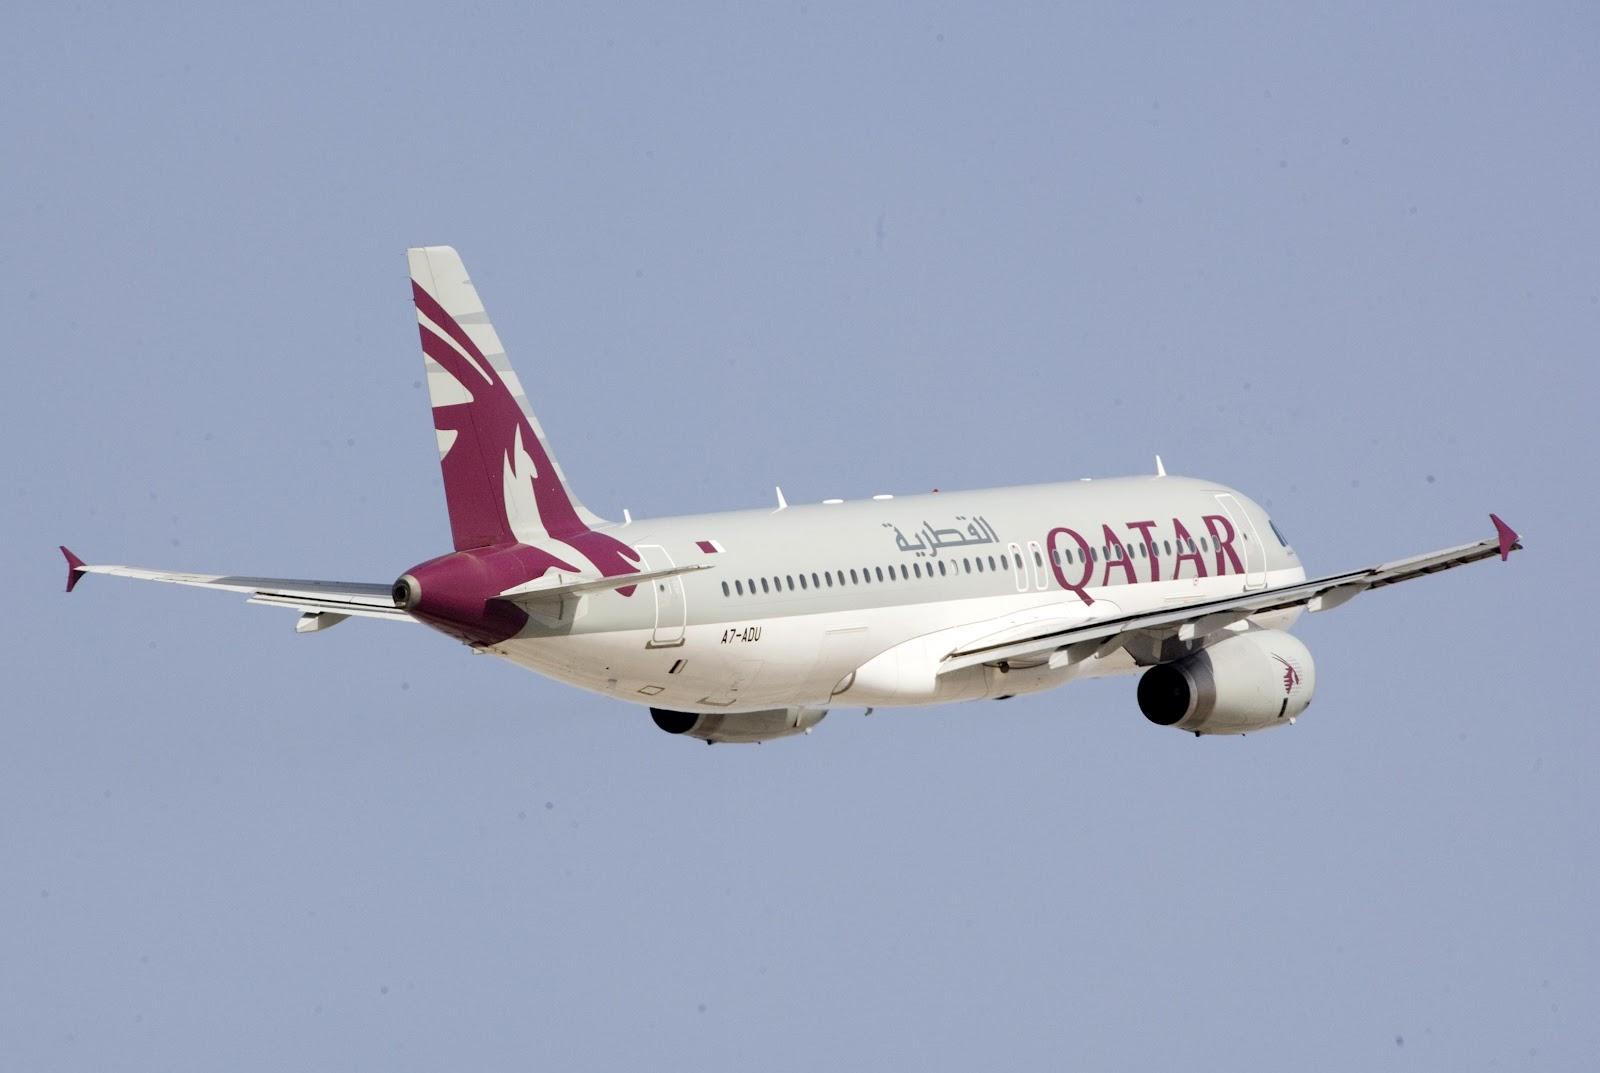 http://3.bp.blogspot.com/-t2Xhn_1z6zU/T_WpnhWC5ZI/AAAAAAAAKik/v_RDv2YR5Qs/s1600/airbus_a320_qatar_airways.jpg